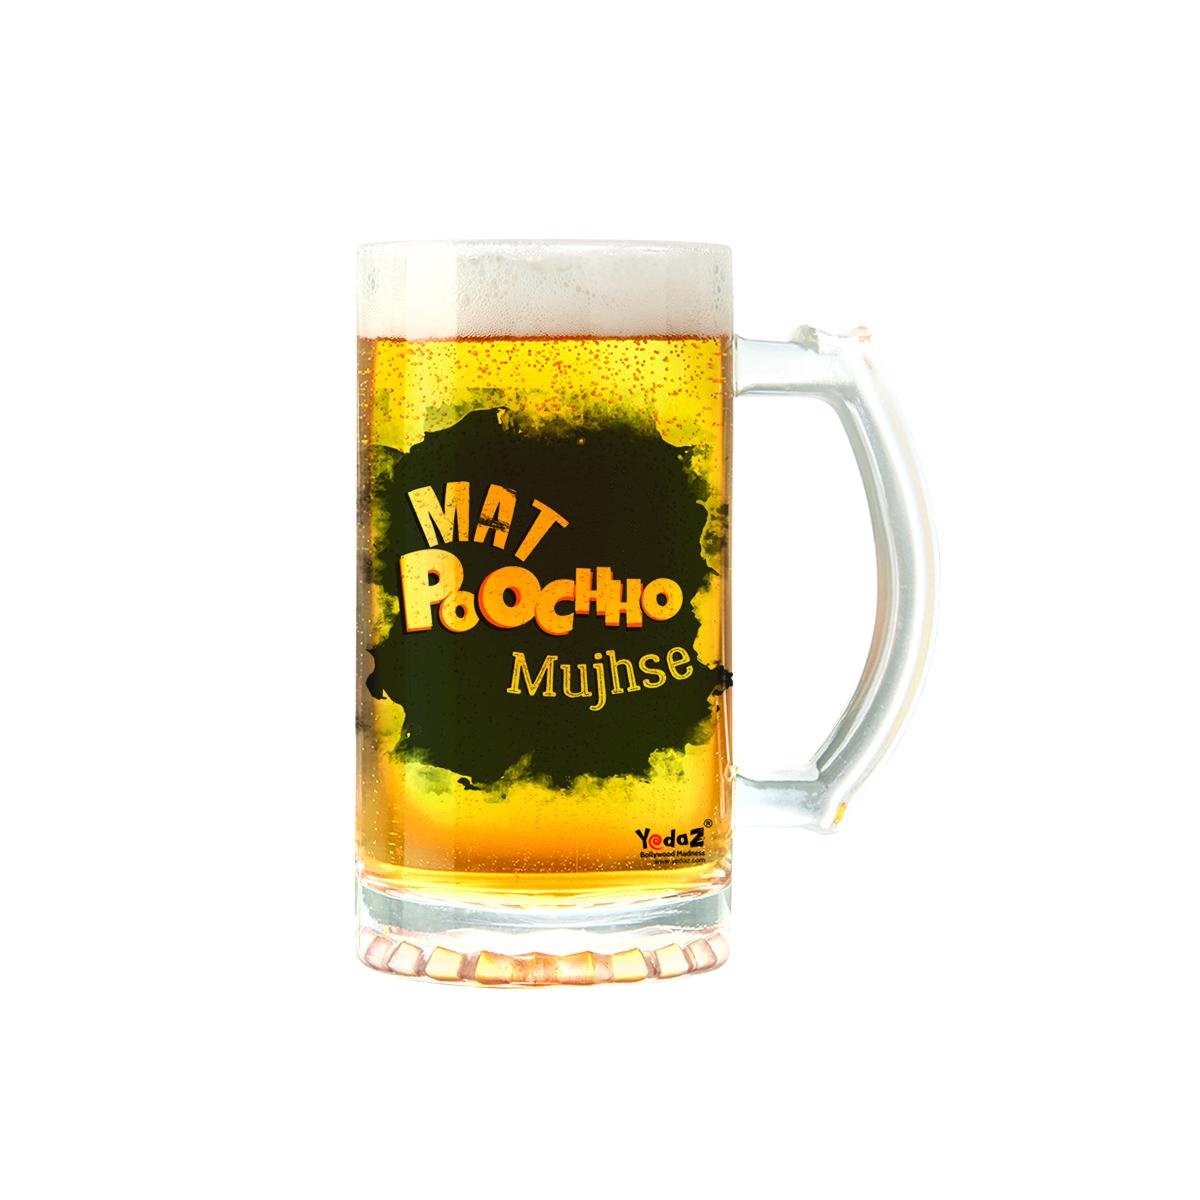 Mat Poocho Mujhse | 600ml - Yedaz Matte Finish Glass Bollywood Beer Mug